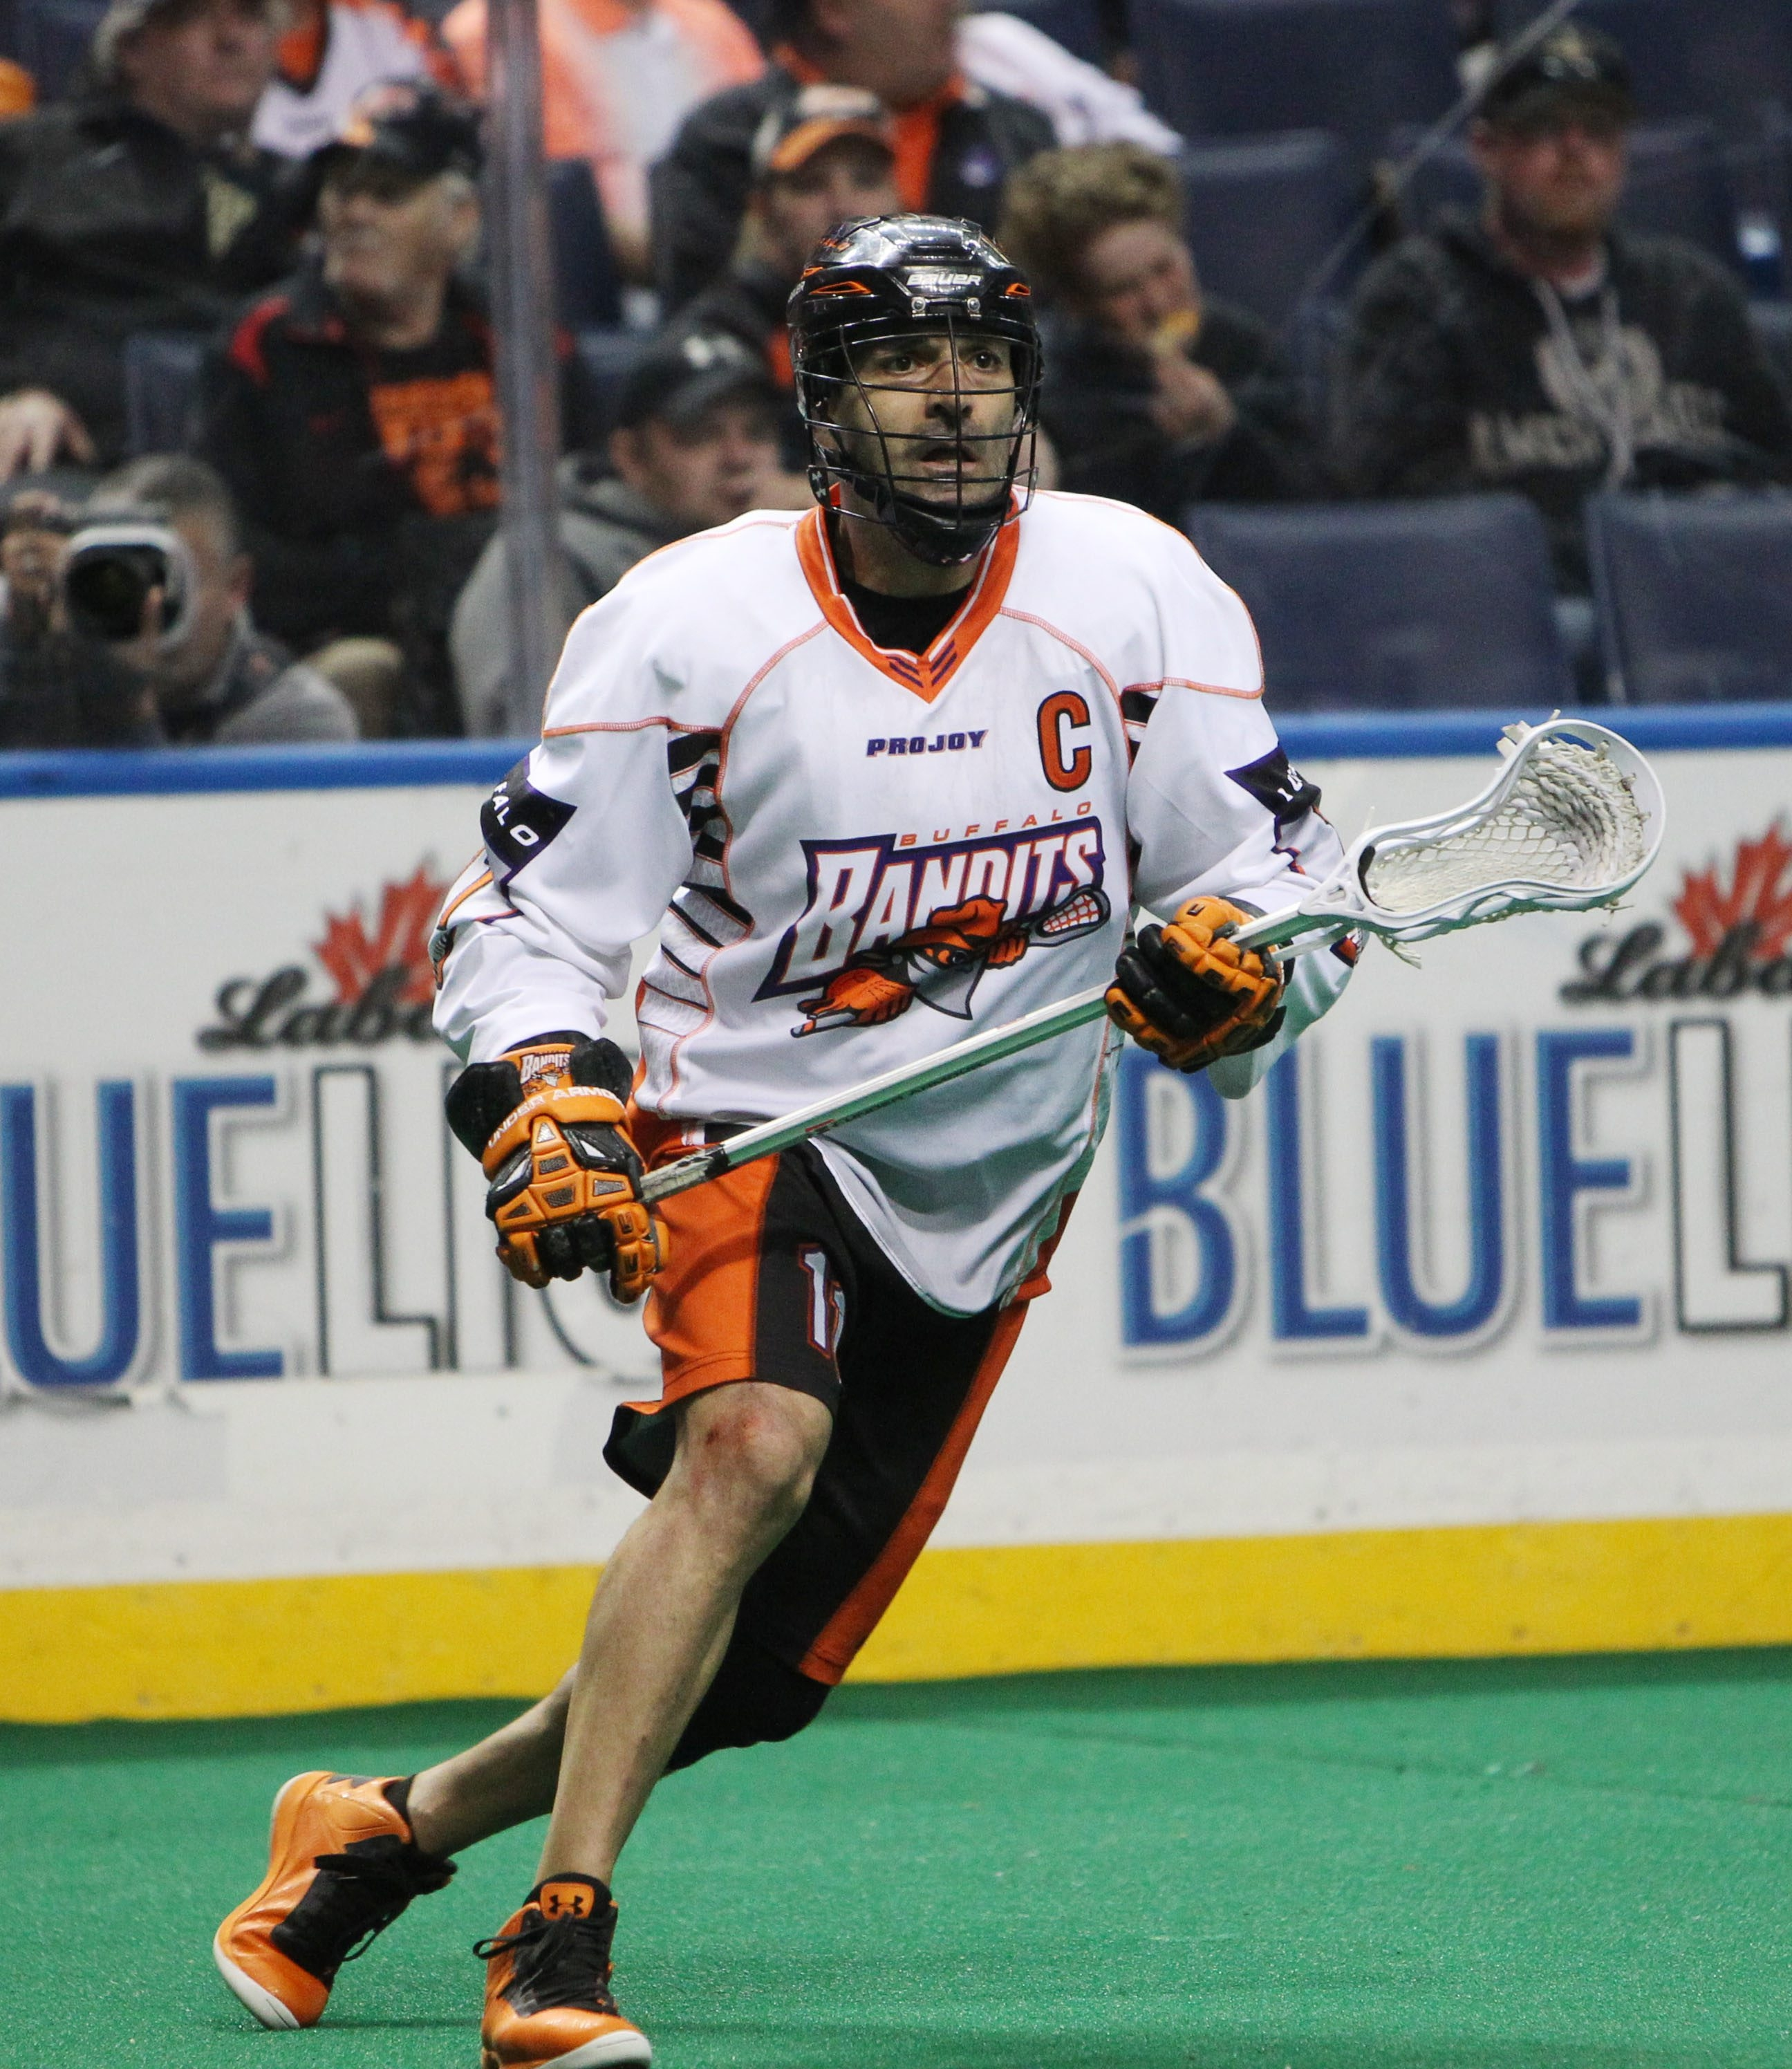 John Tavares has been a Buffalo Bandit since the team's first season in 1992.